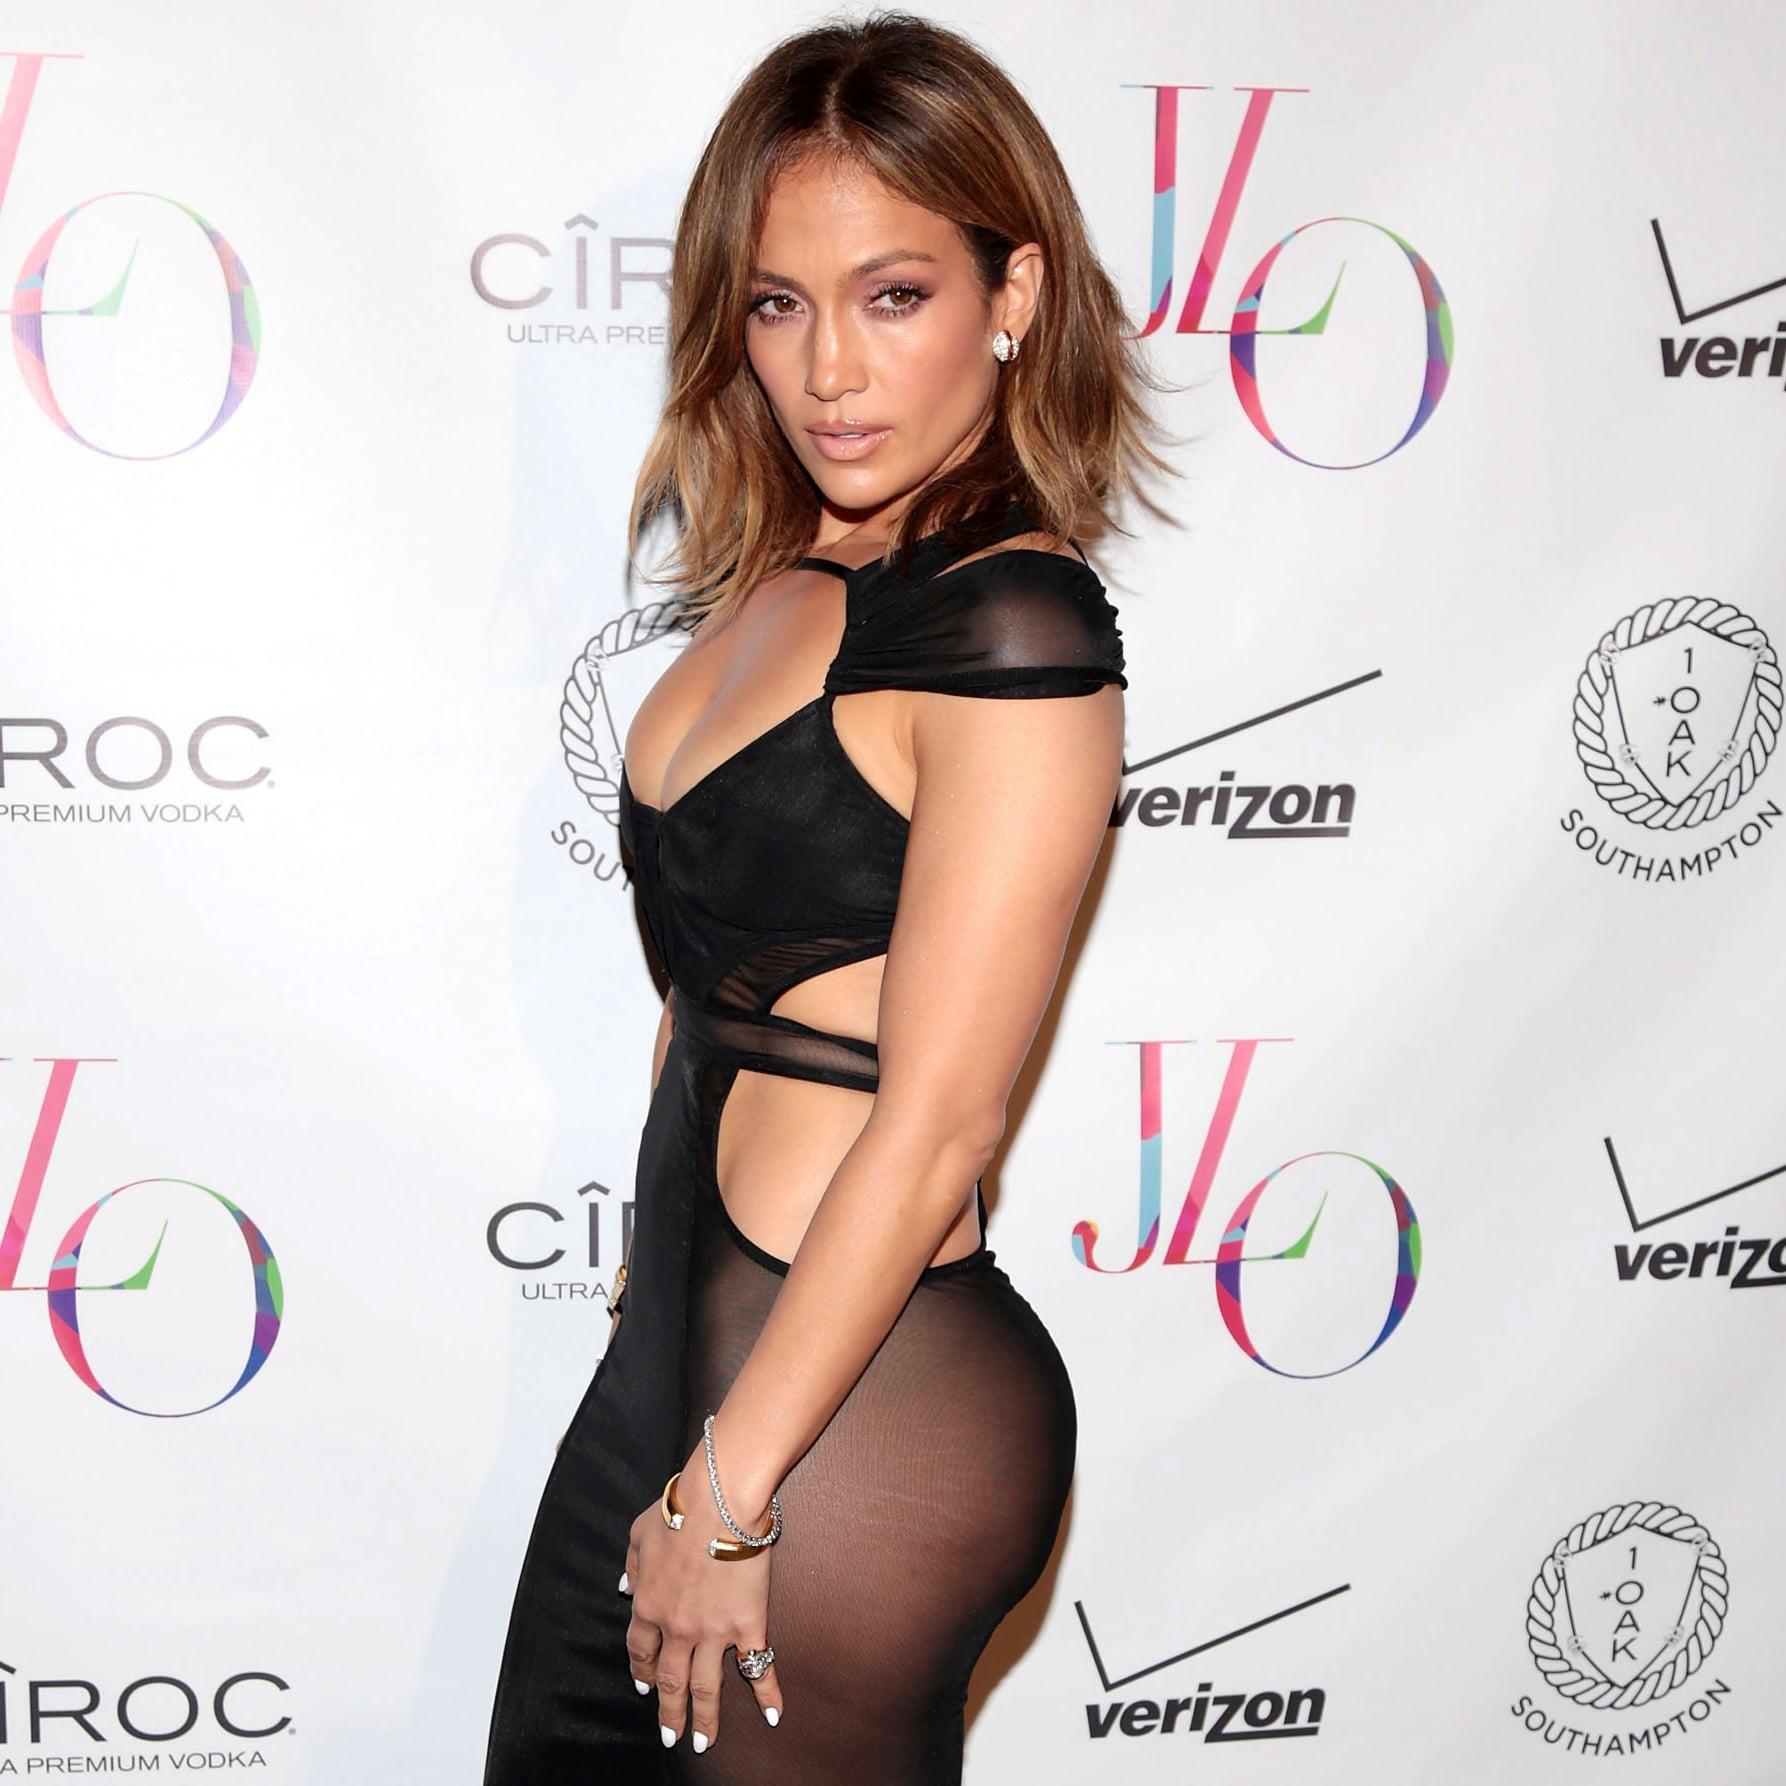 Jennifer lopez sexy 46th birtday new pics